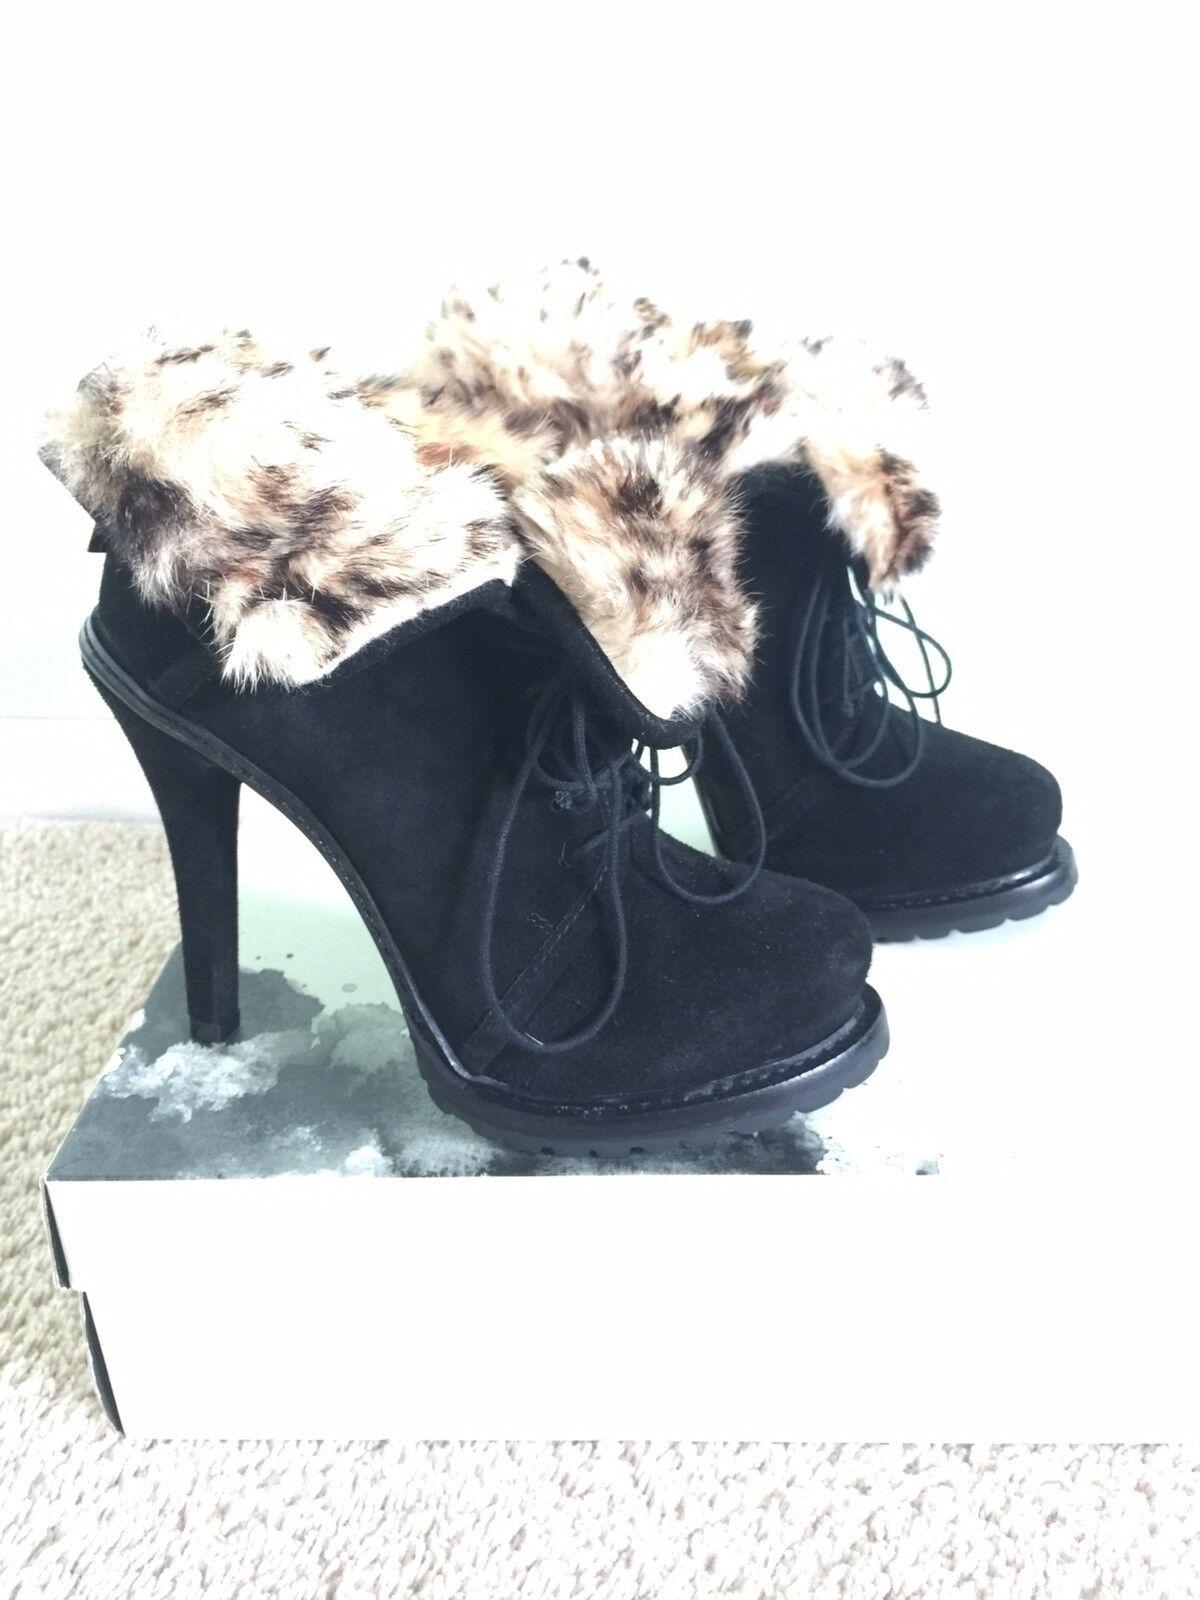 359 Elizabeth And James Fur Lined Black Suede Ankle Boots m/ laces Size 7